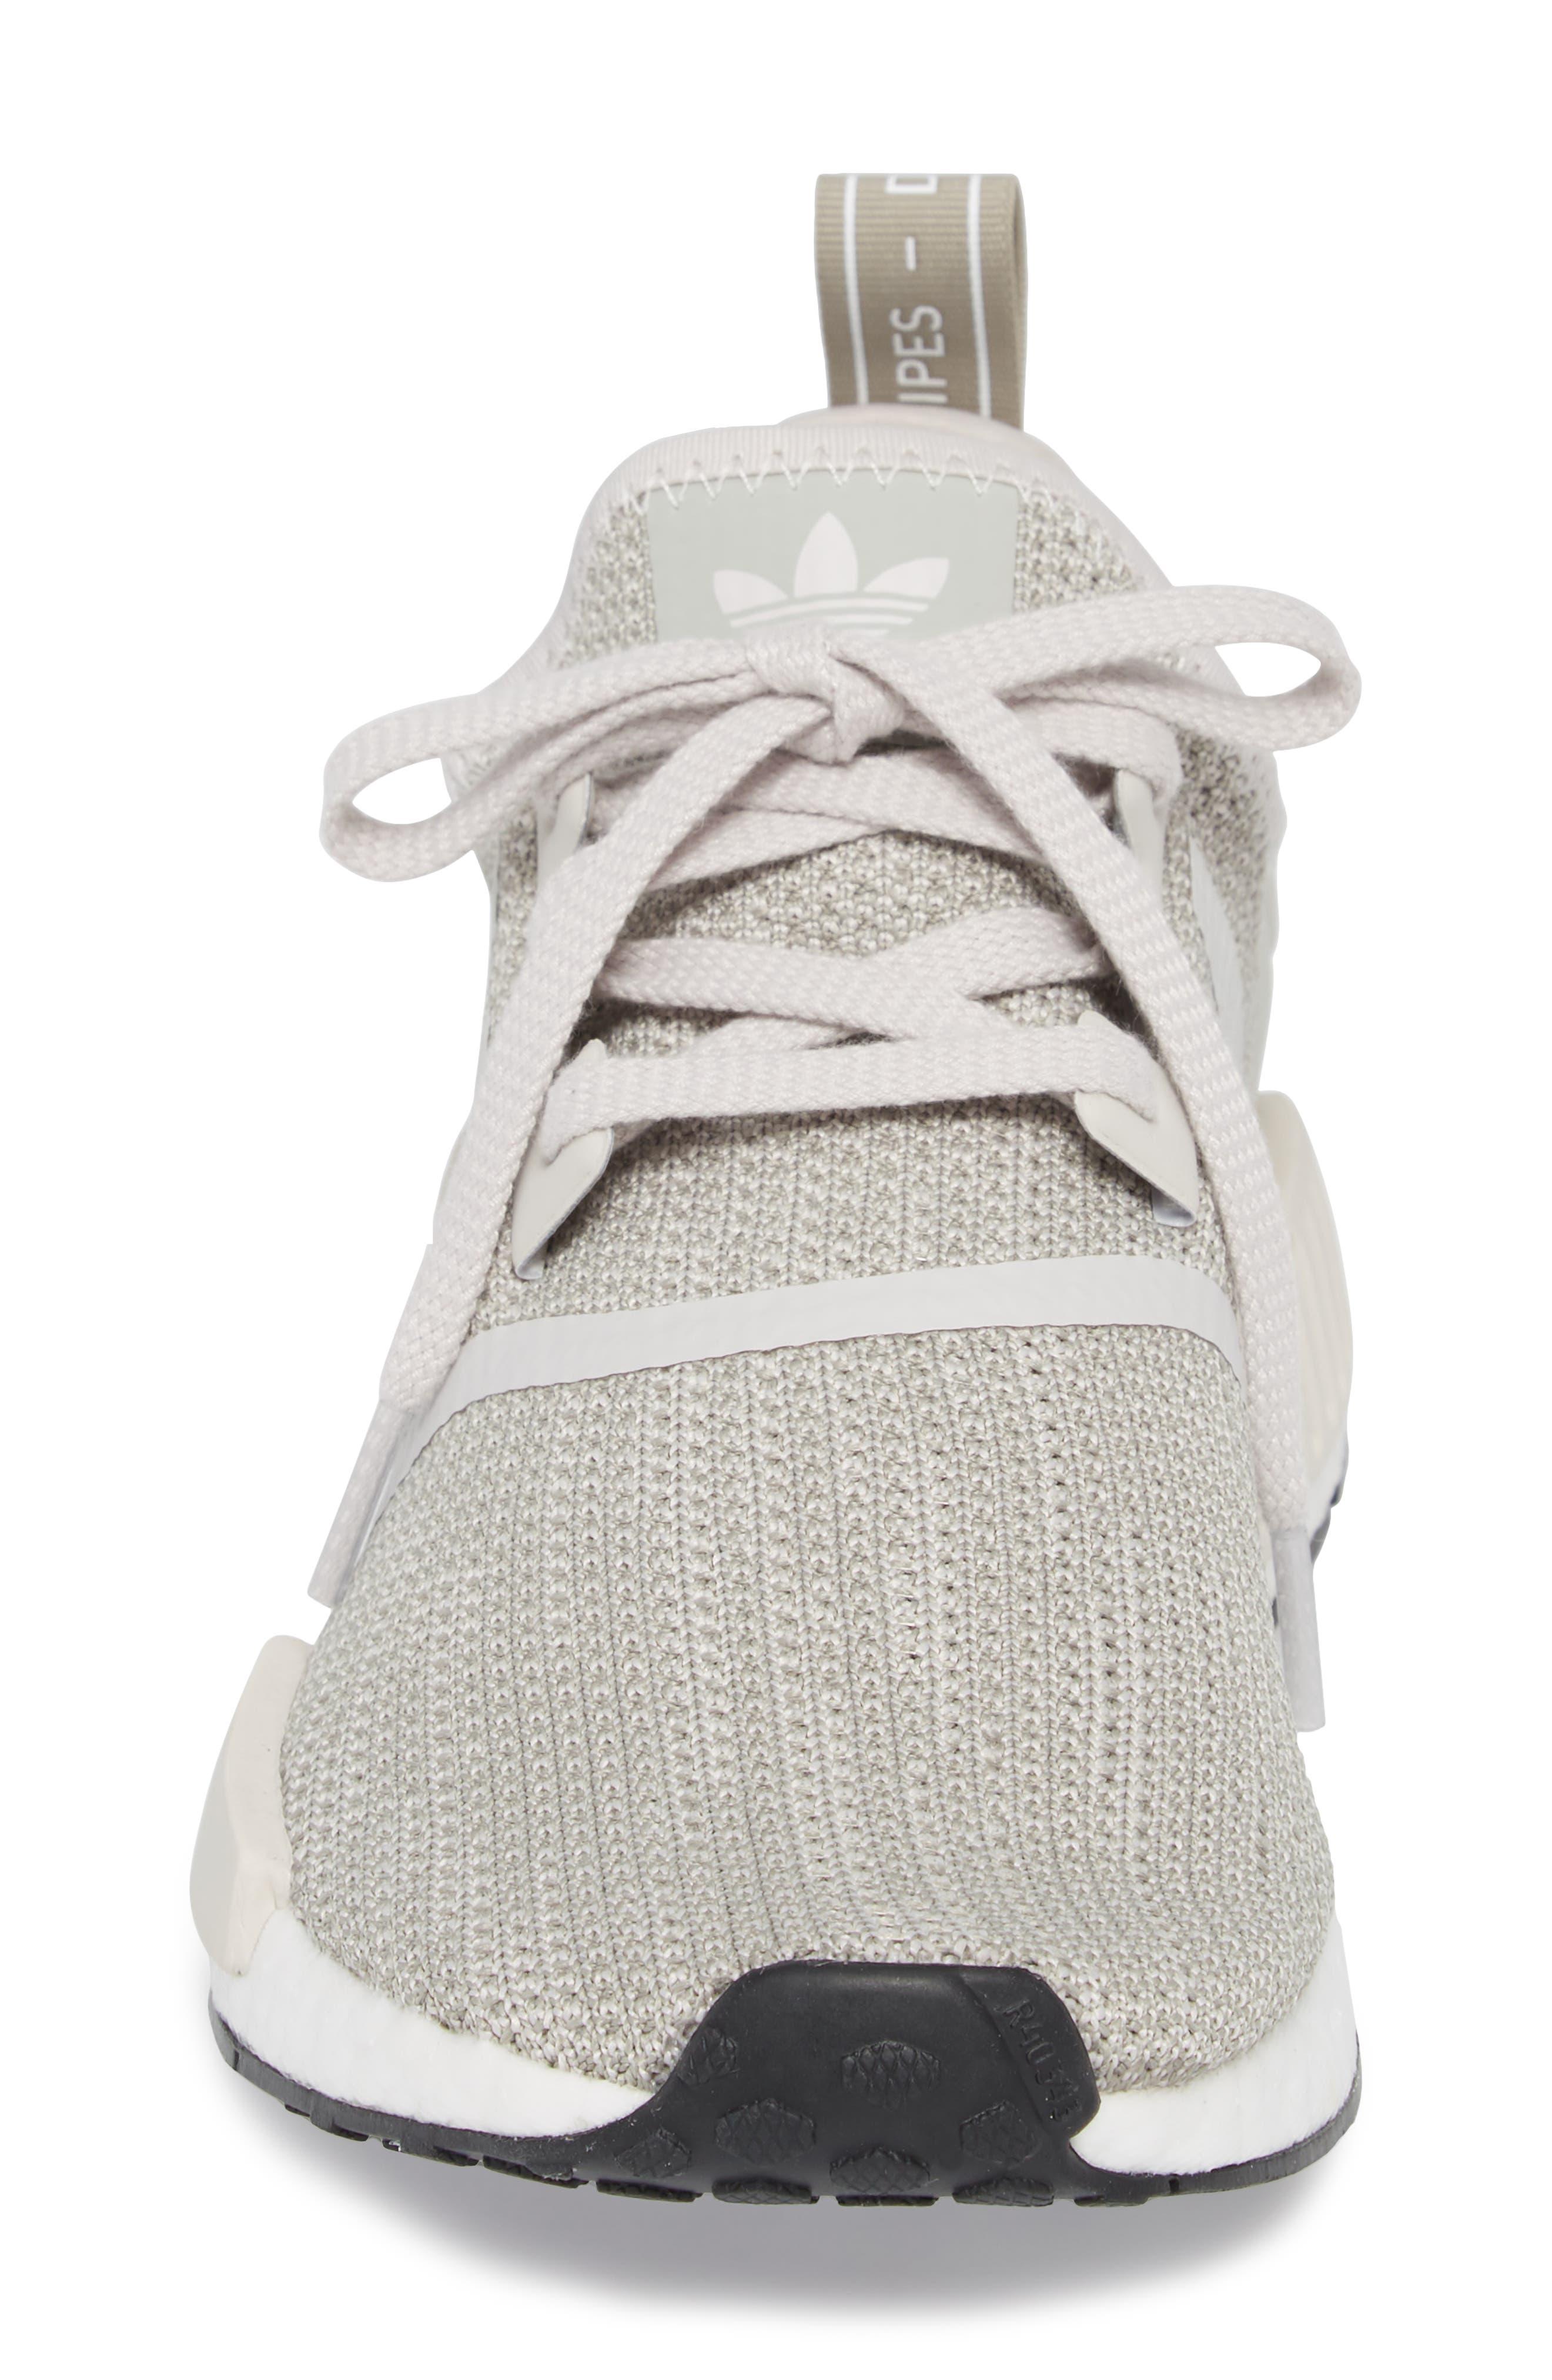 NMD_R1 Sneaker,                             Alternate thumbnail 4, color,                             Raw Gold/ Tech Beige/ Black